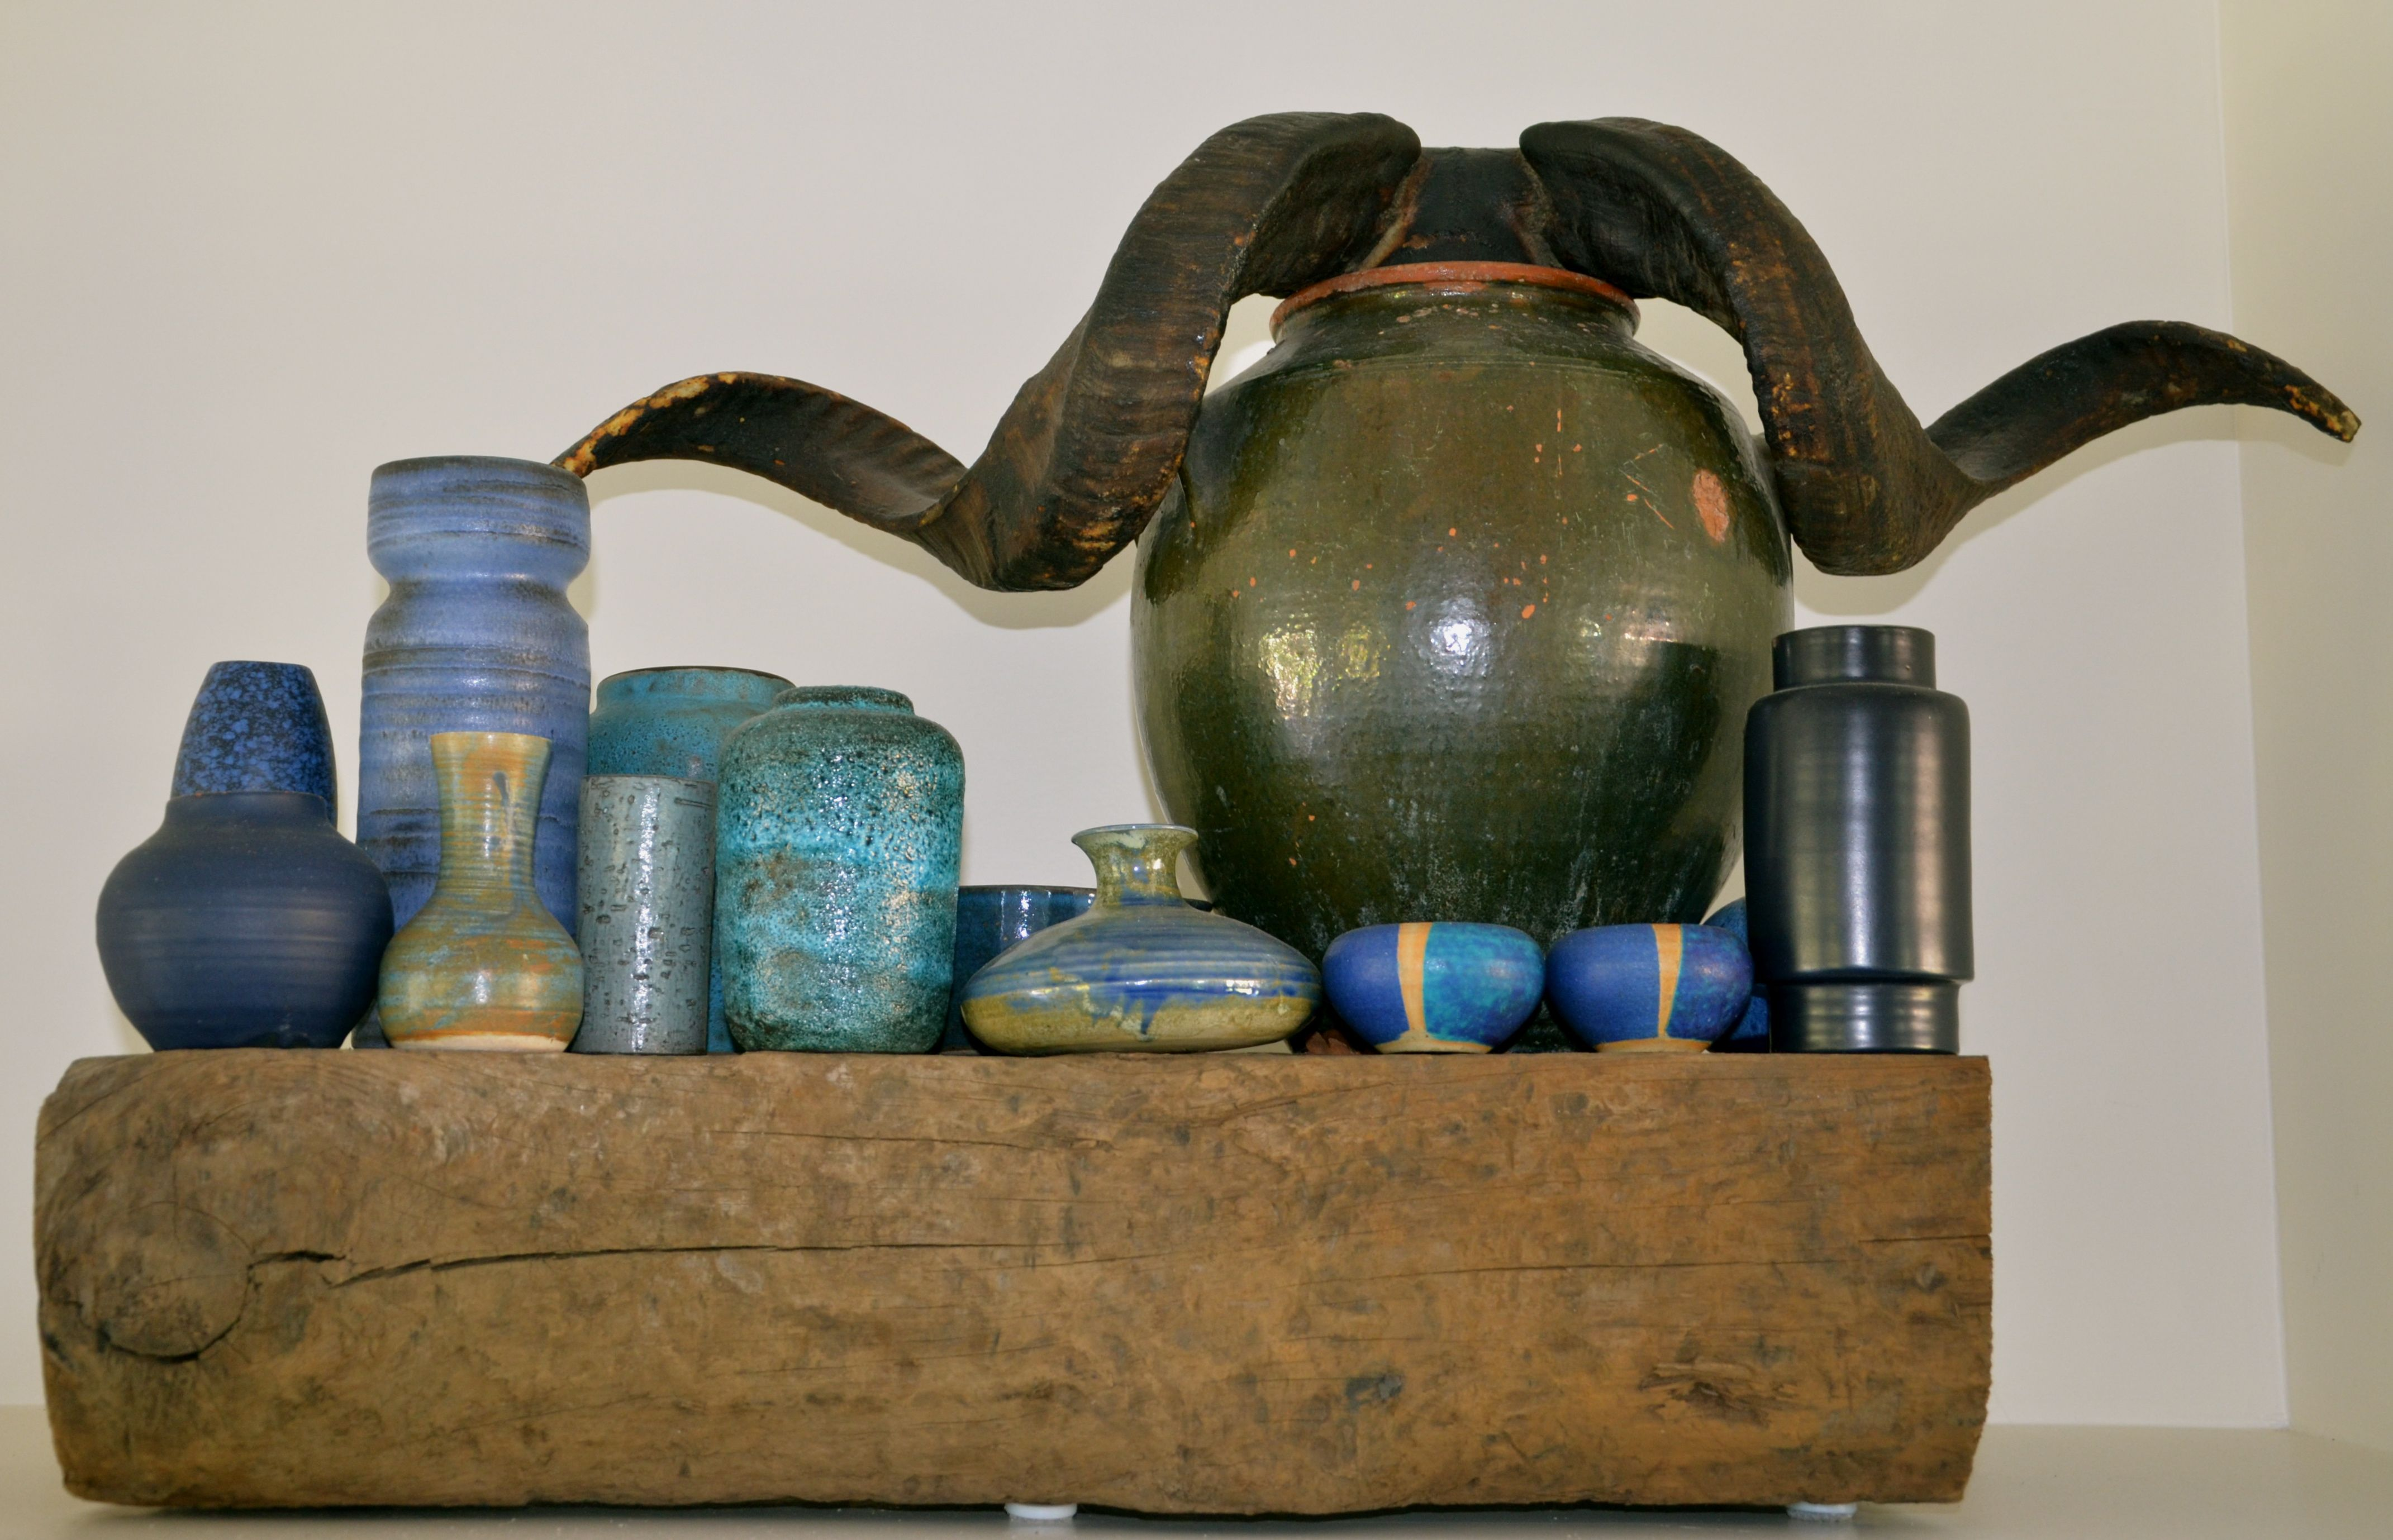 Handmade ceramics from black to light blue